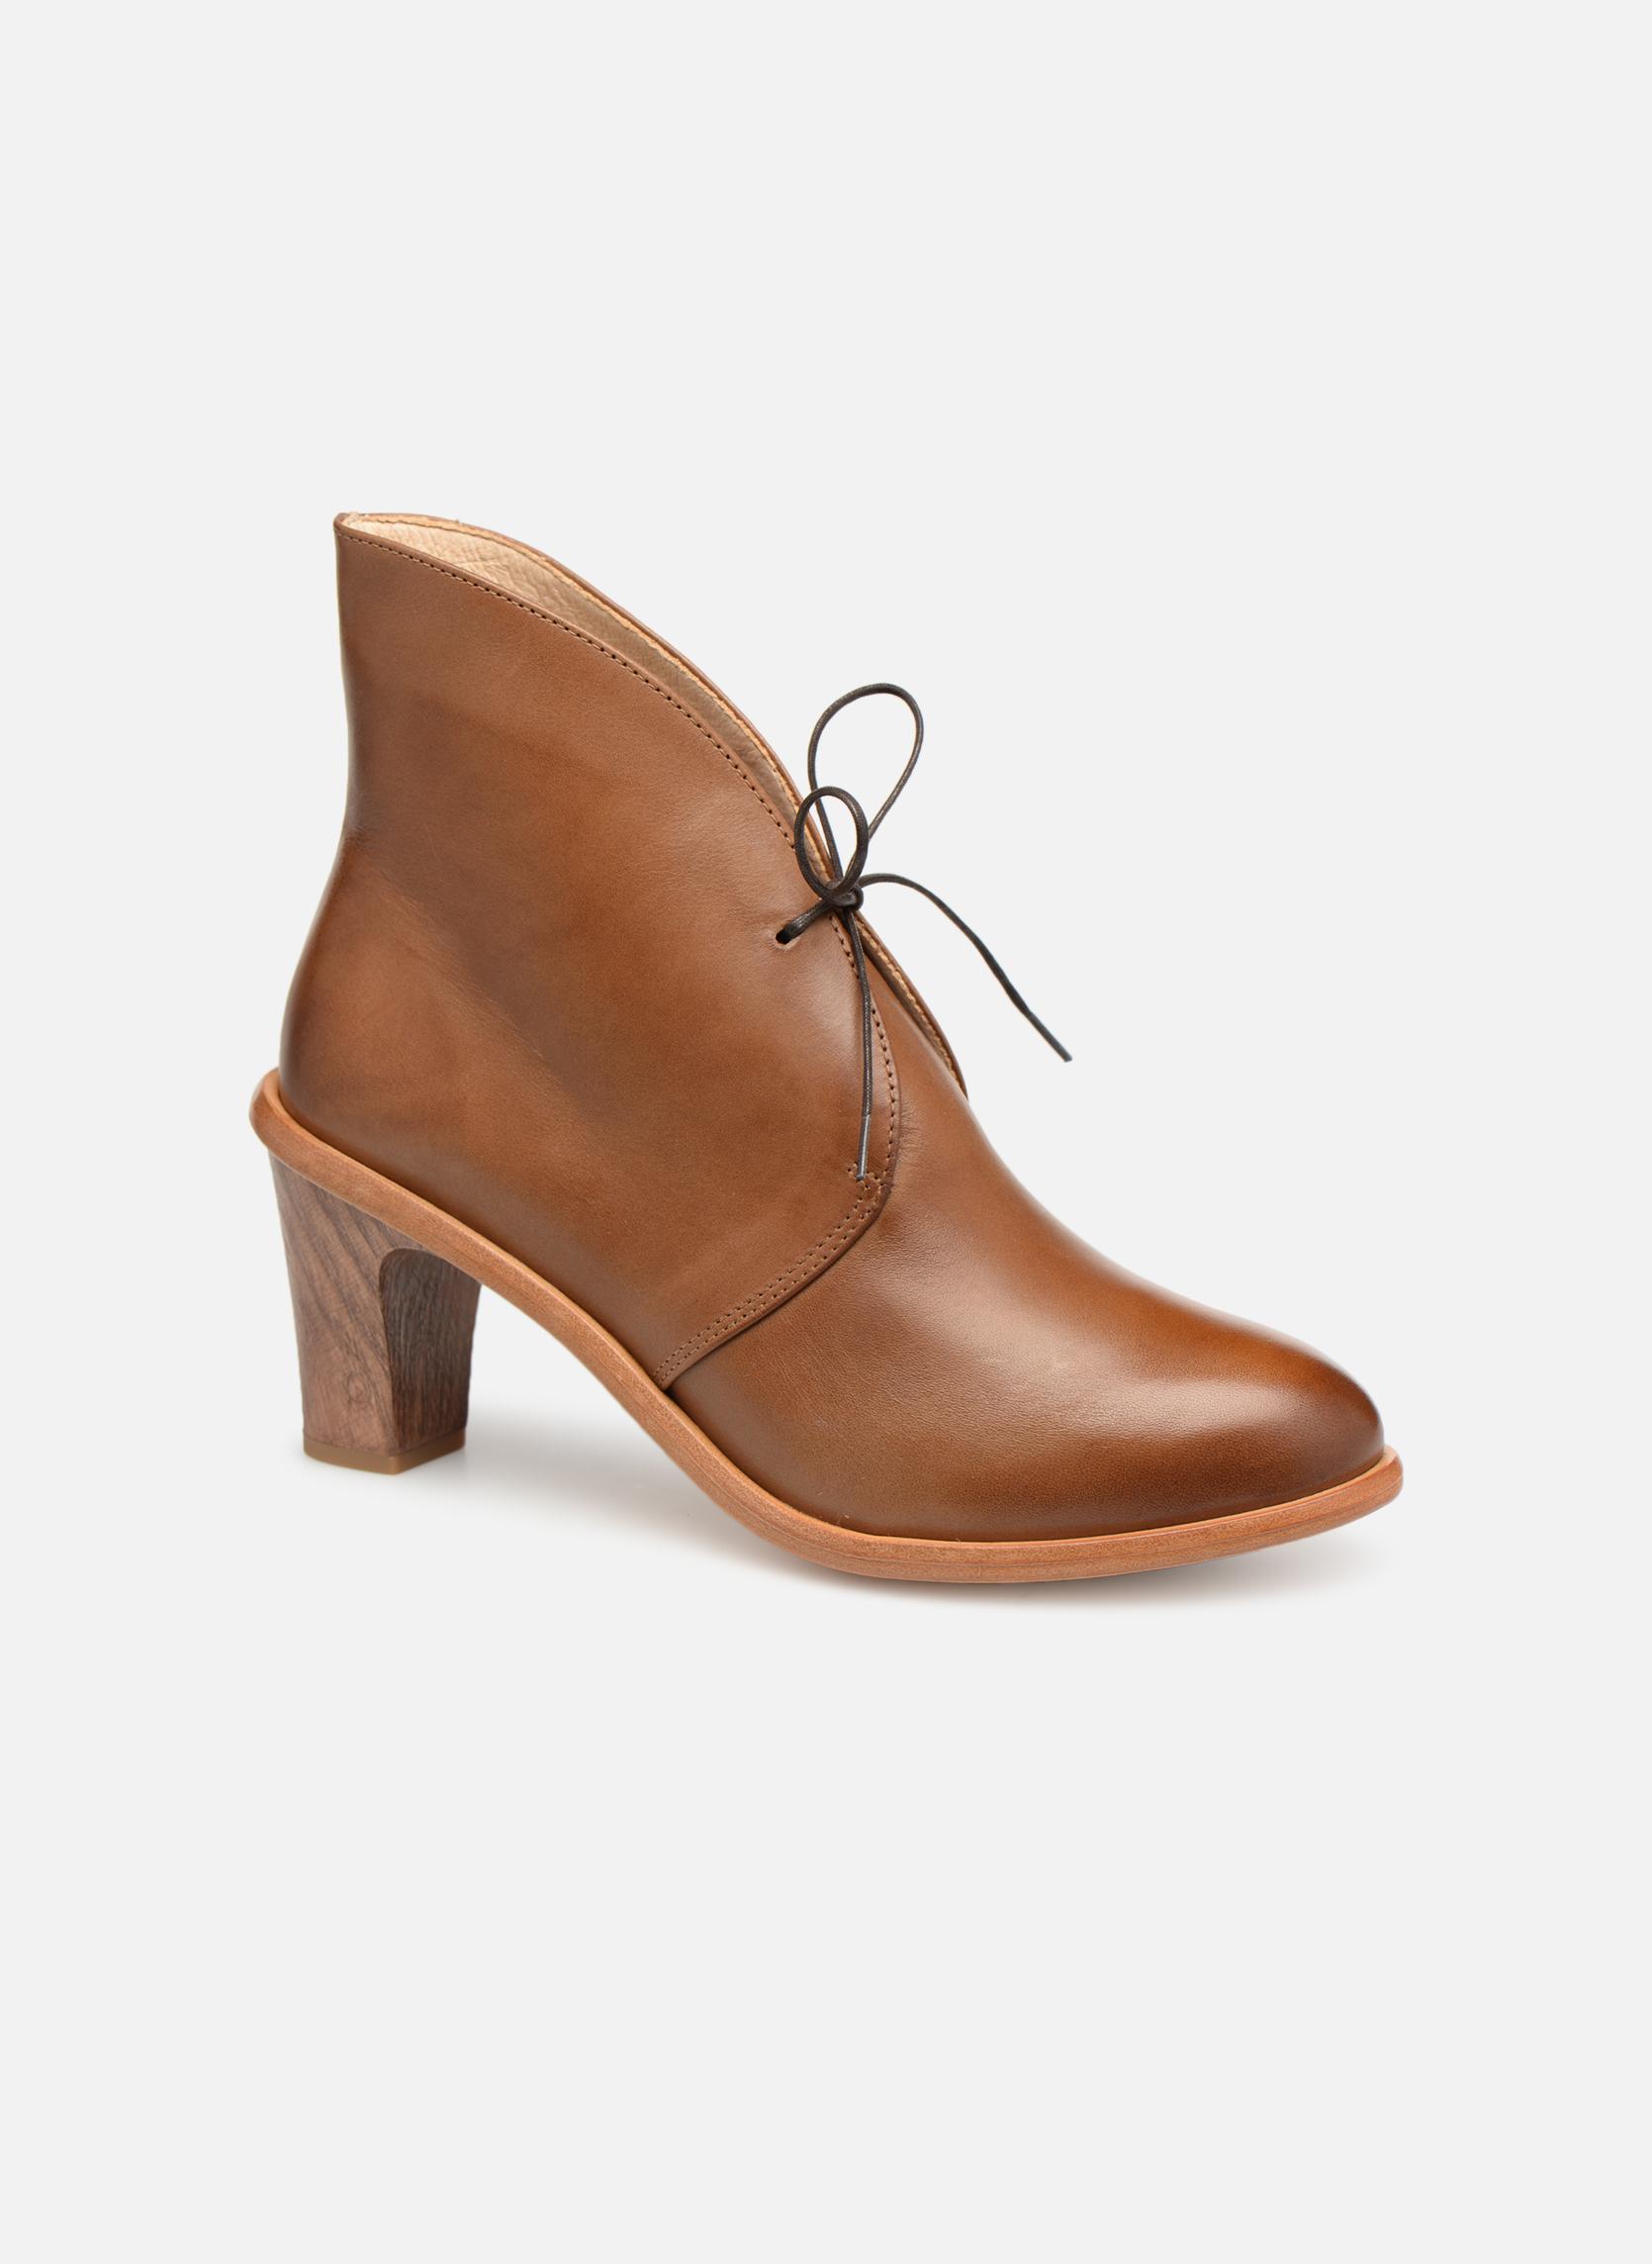 Grandes descuentos últimos zapatos Neosens CYNTHIA (Marrón) - Botines  Descuento